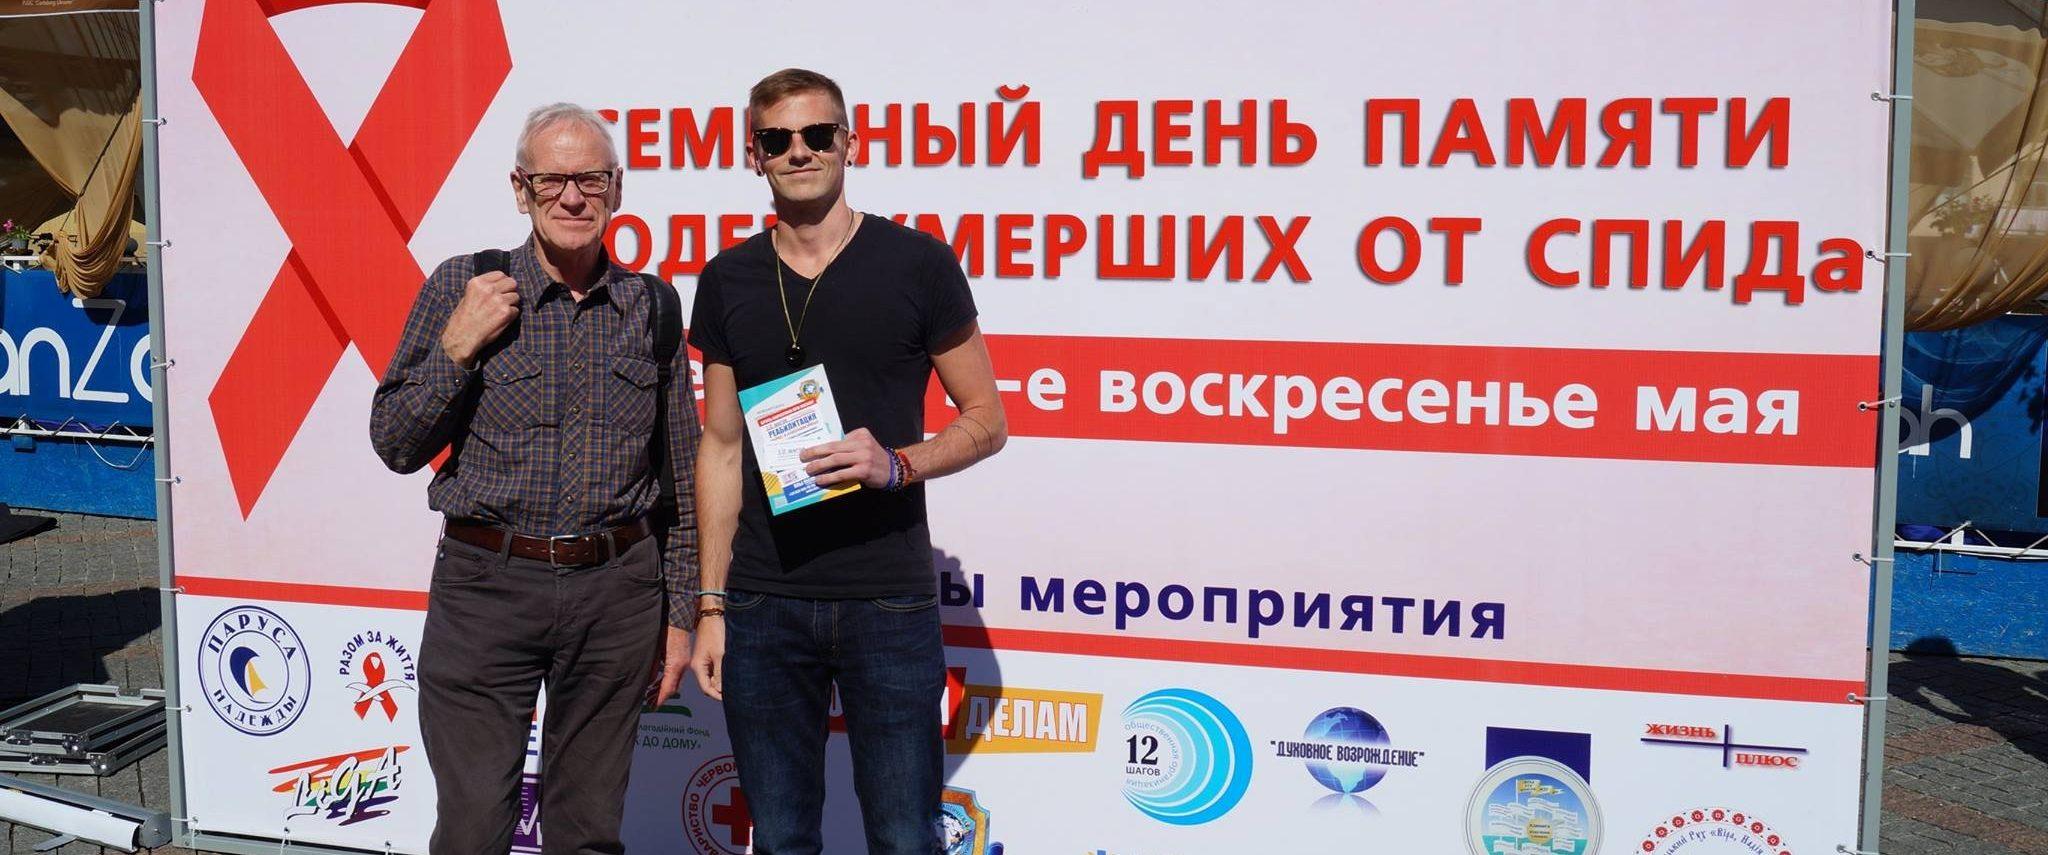 LGBT in the Ukraine